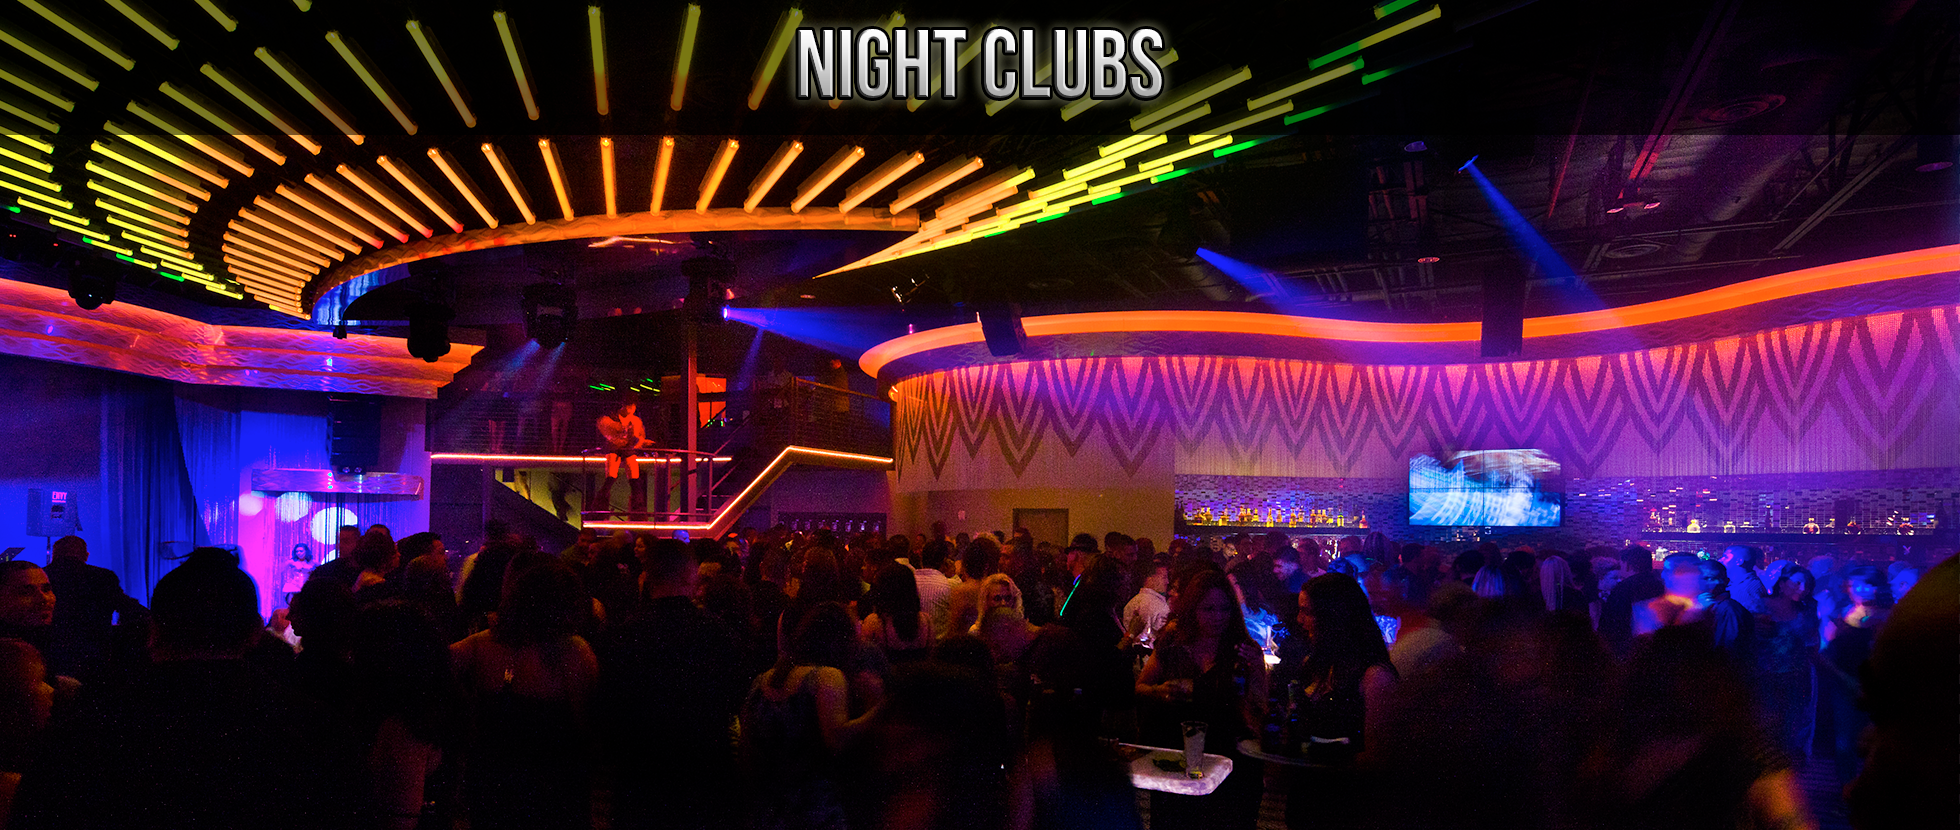 Night-clubs